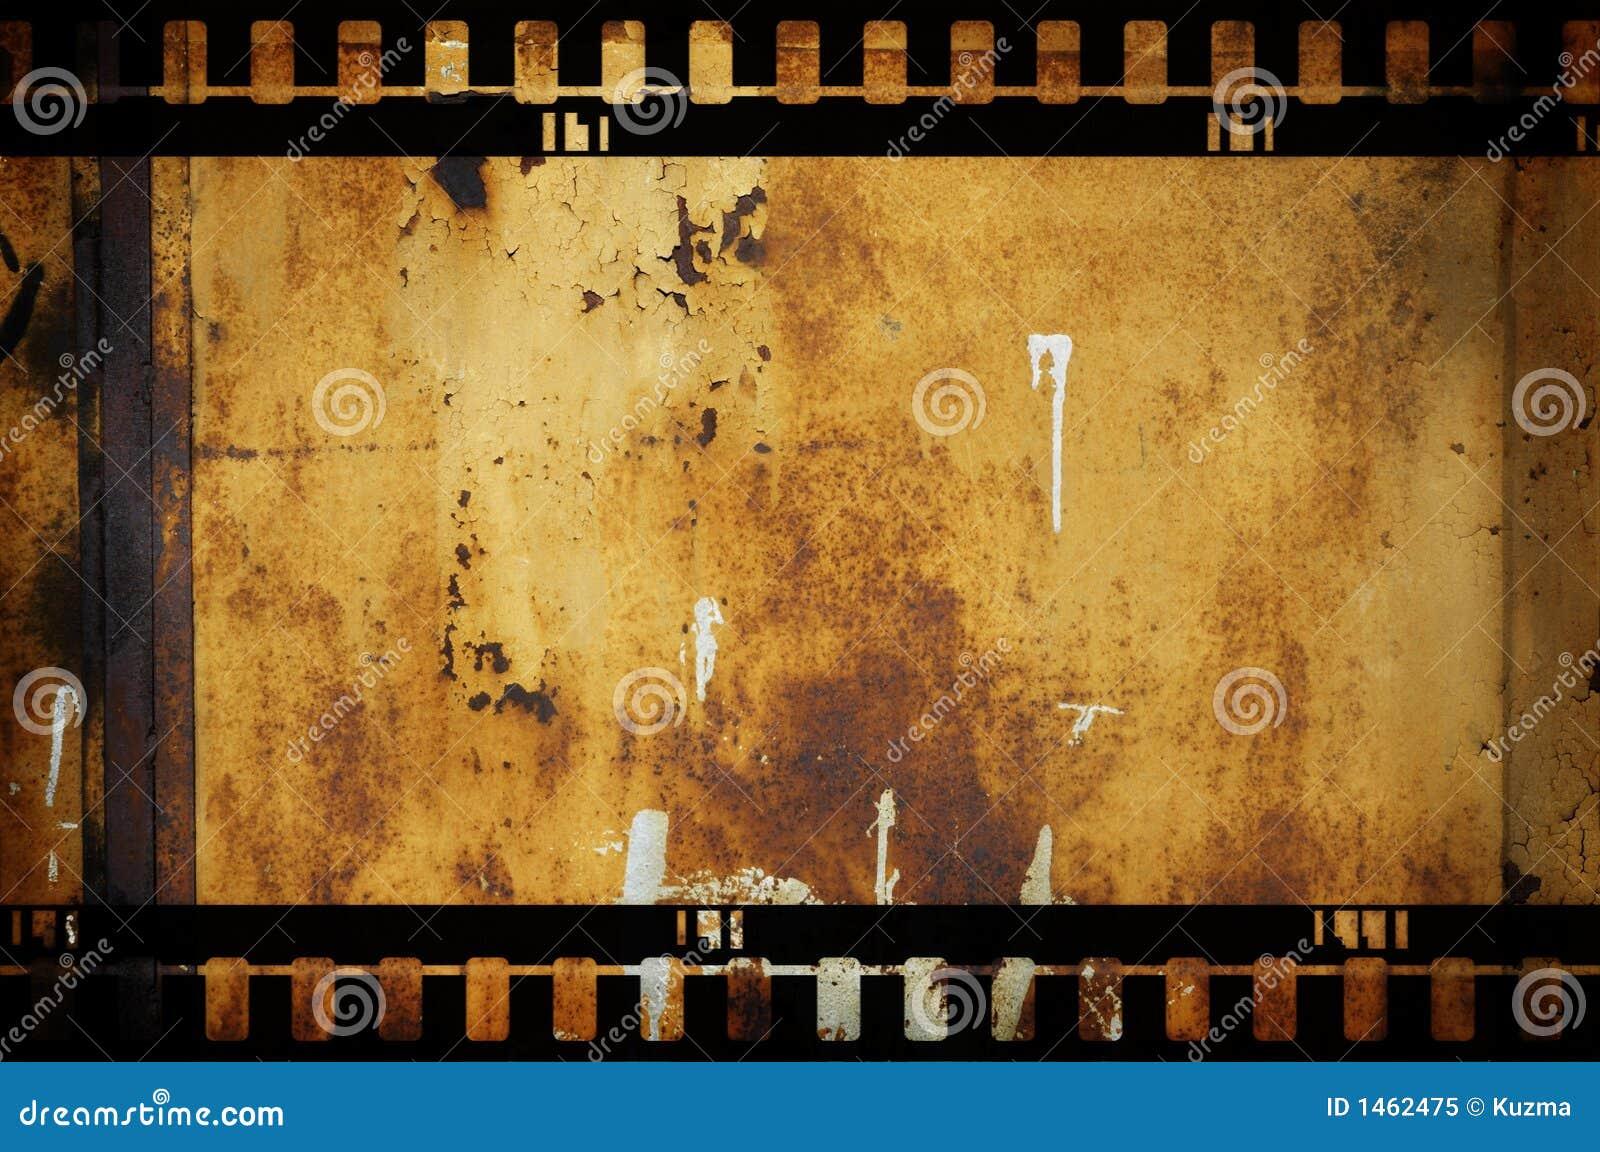 Filmgrunge